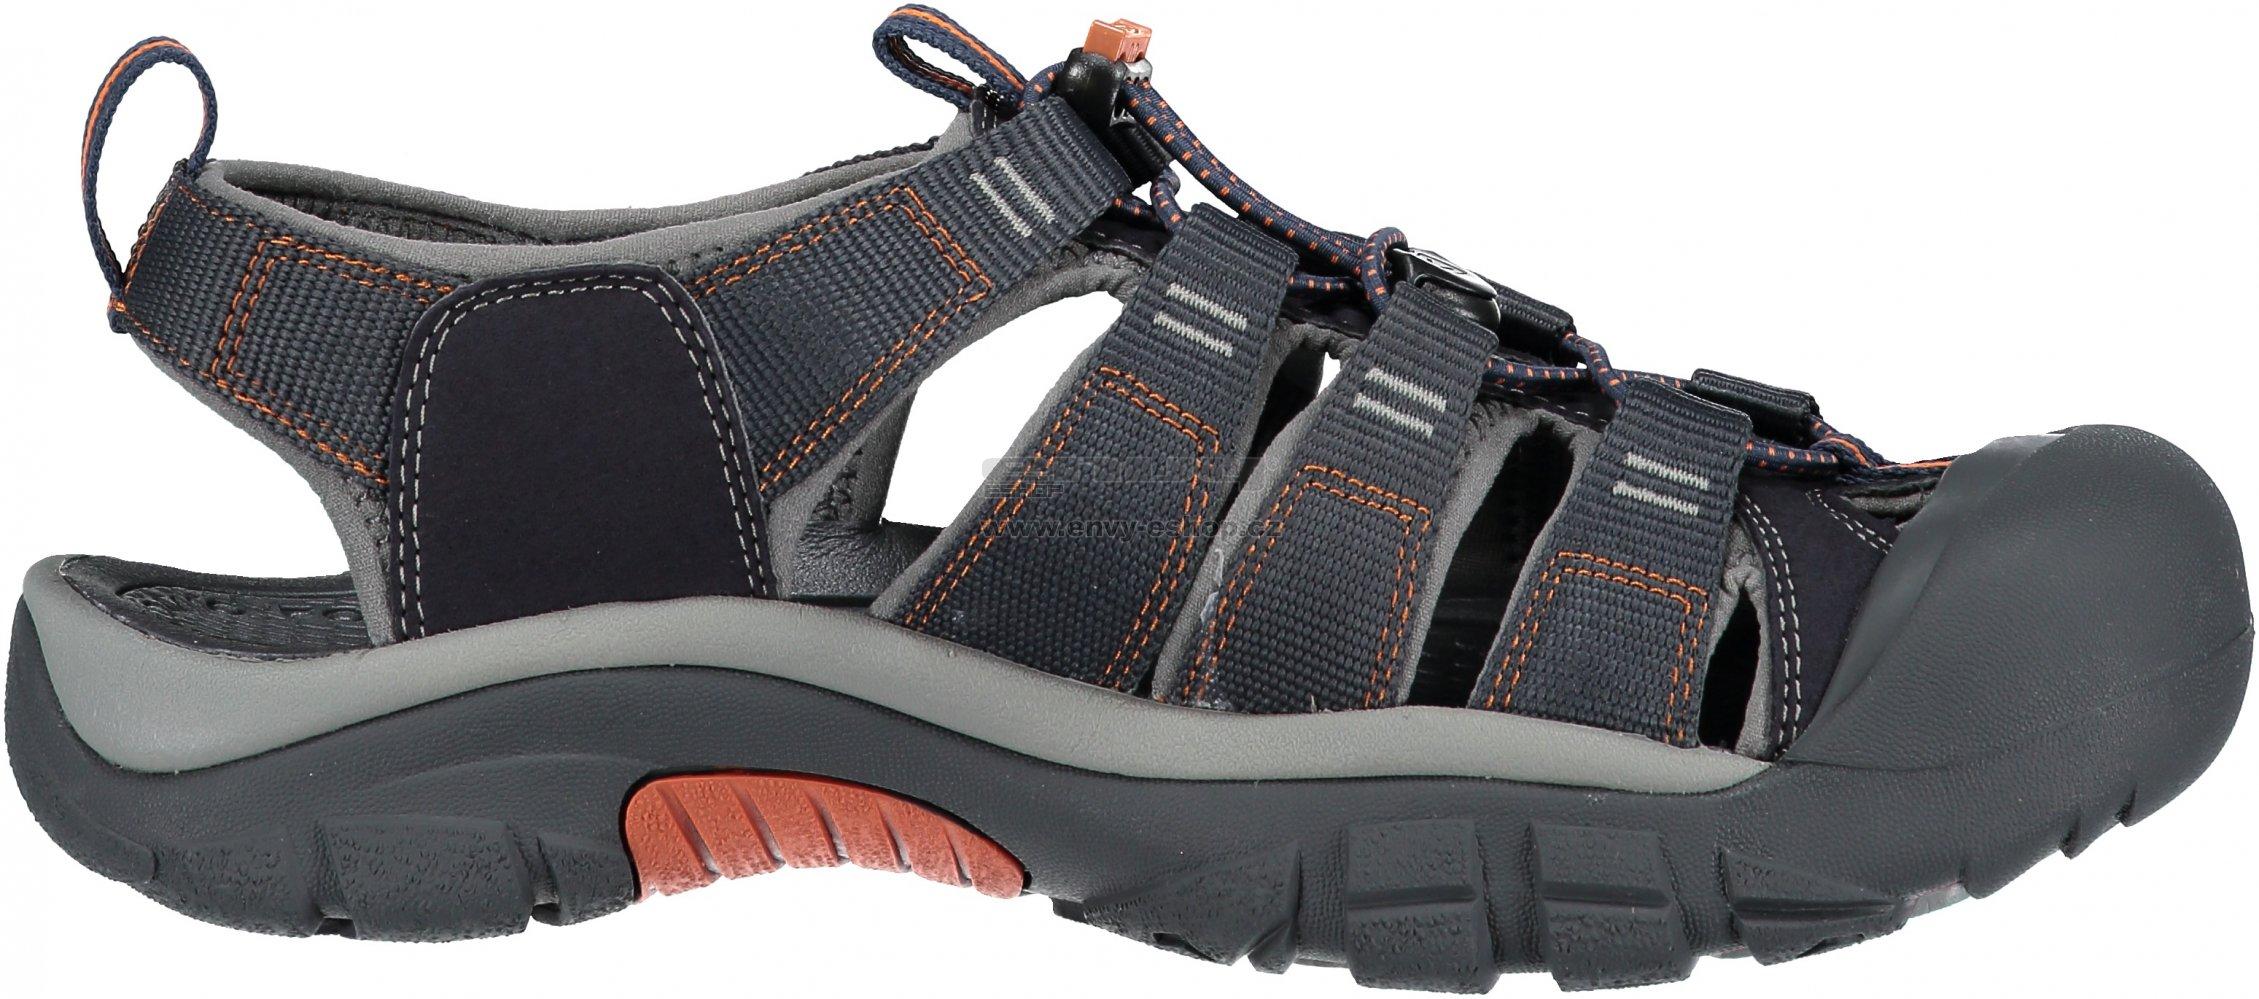 71a0cefa58c6 Pánské sandále KEEN NEWPORT H2 M INDIA INK RUST velikost  47 ( 12 ...